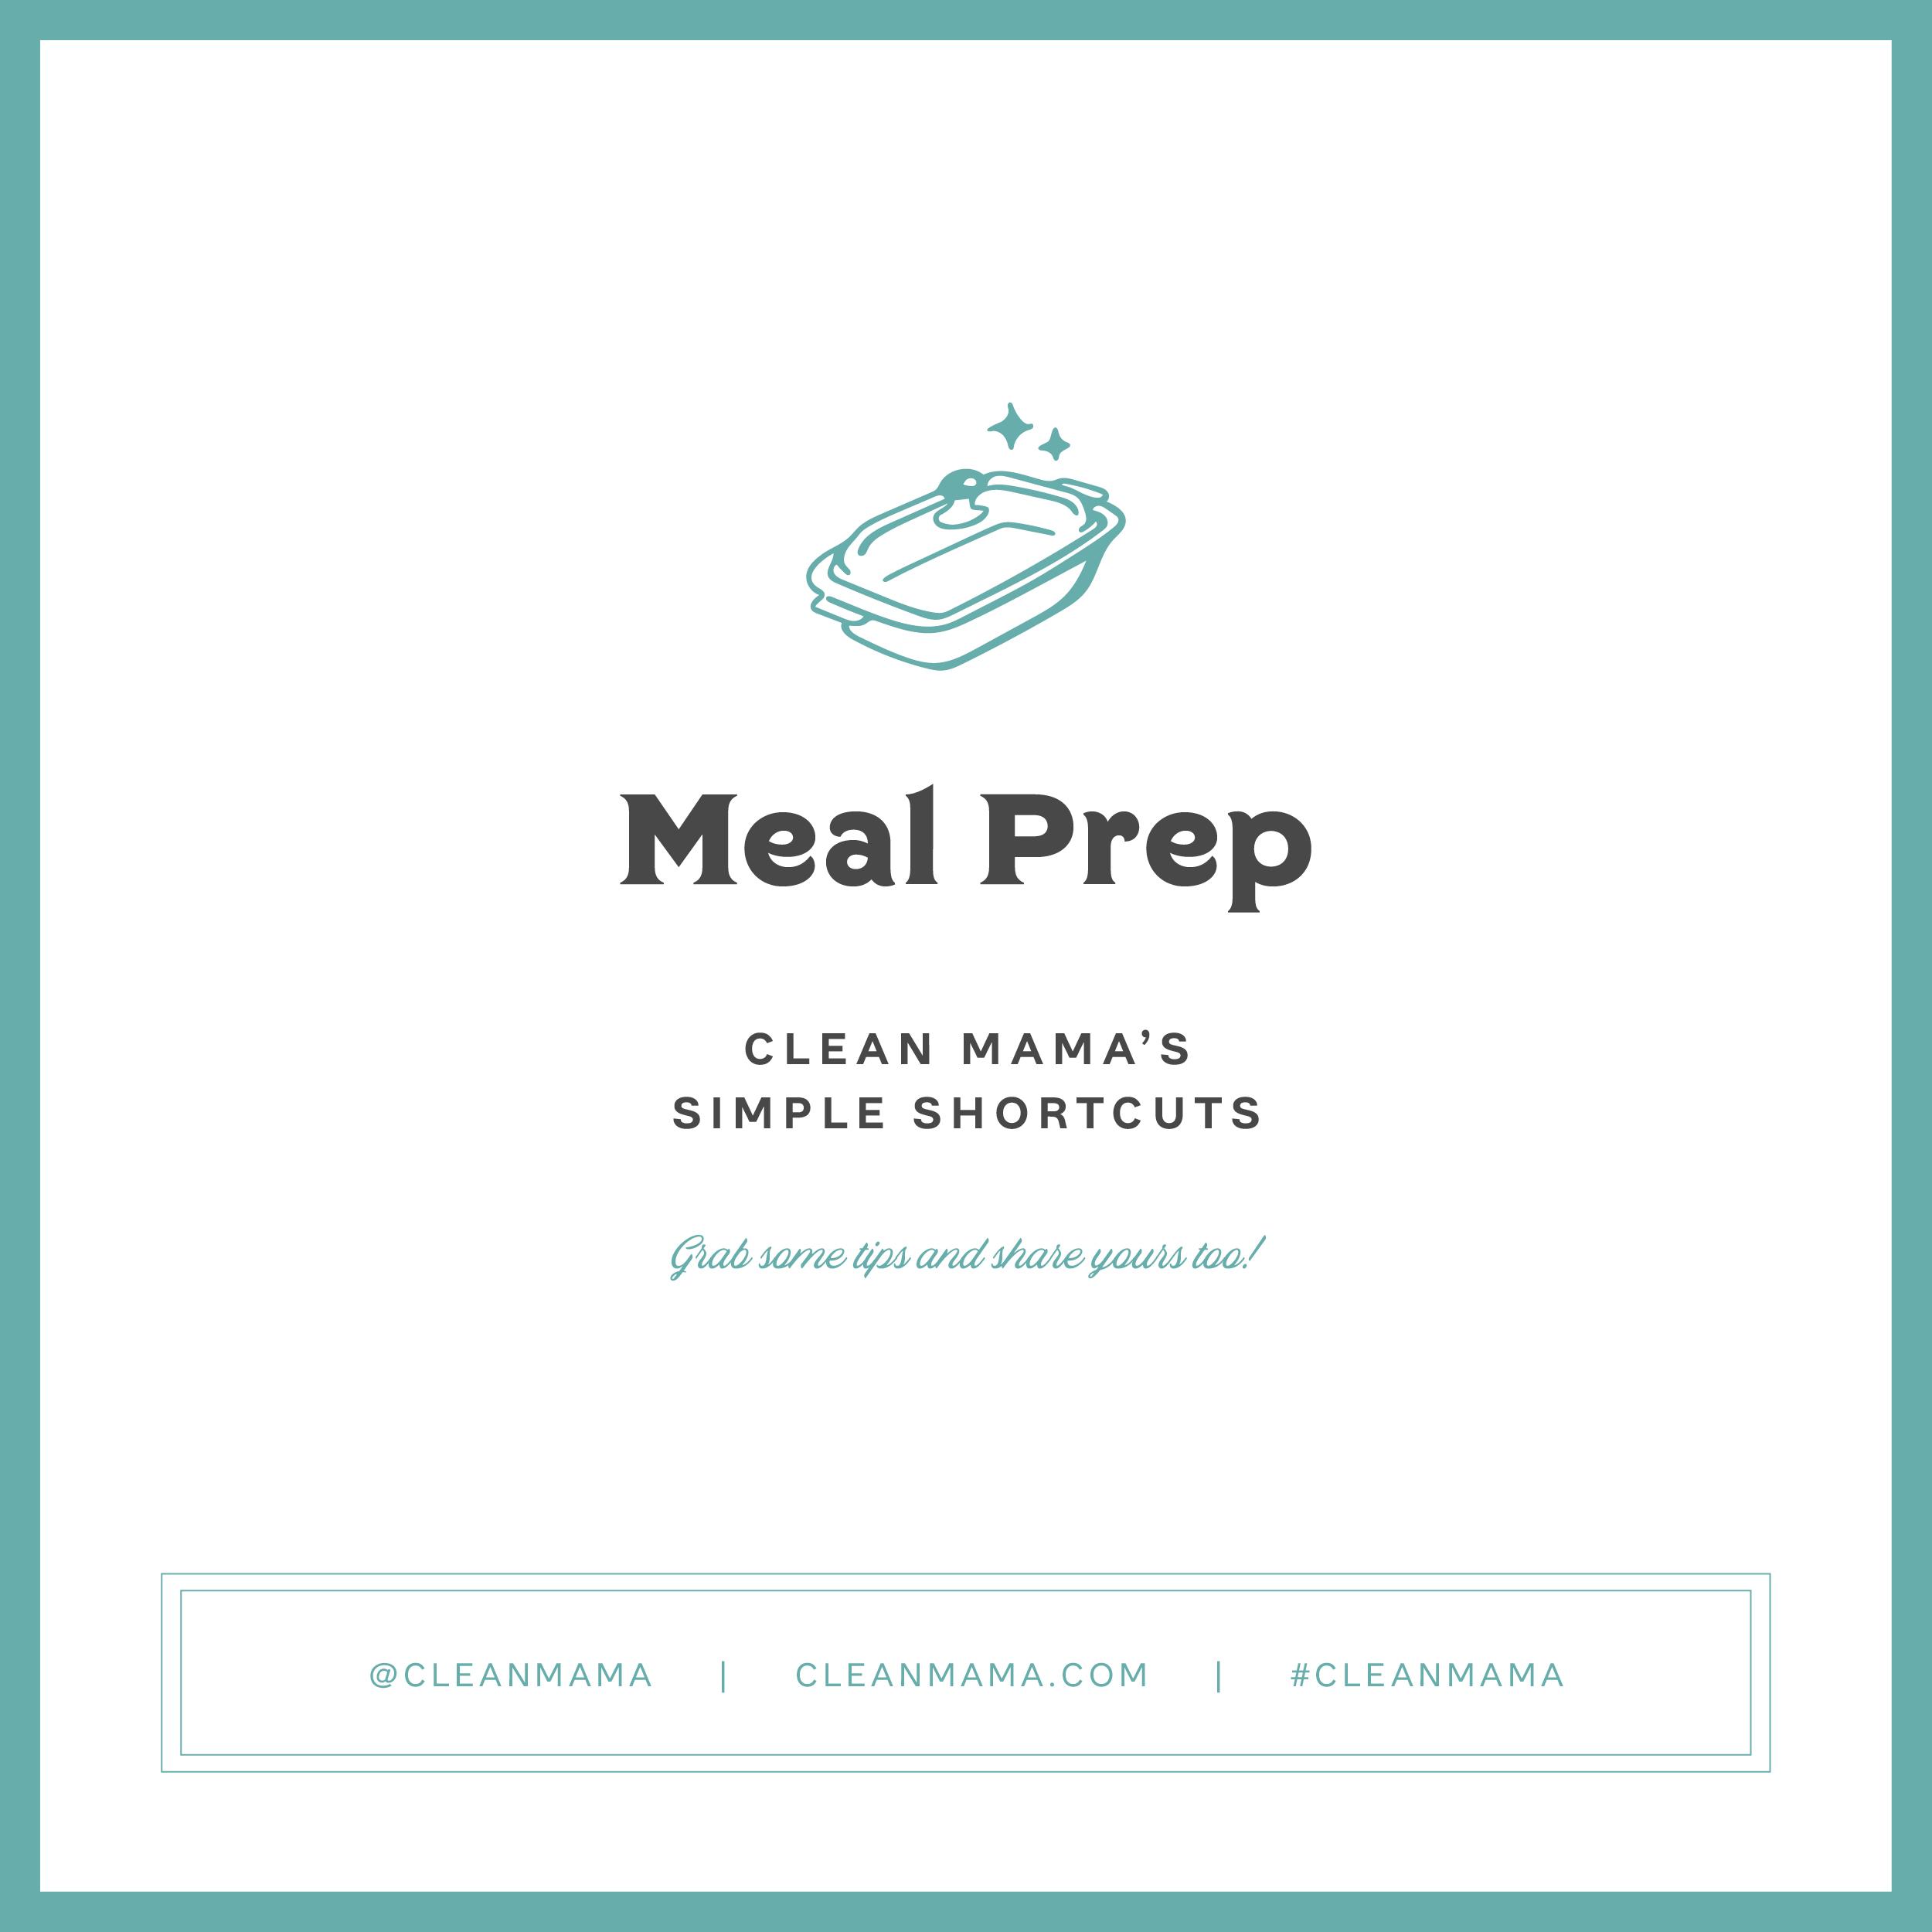 Meal Prep – Clean Mama